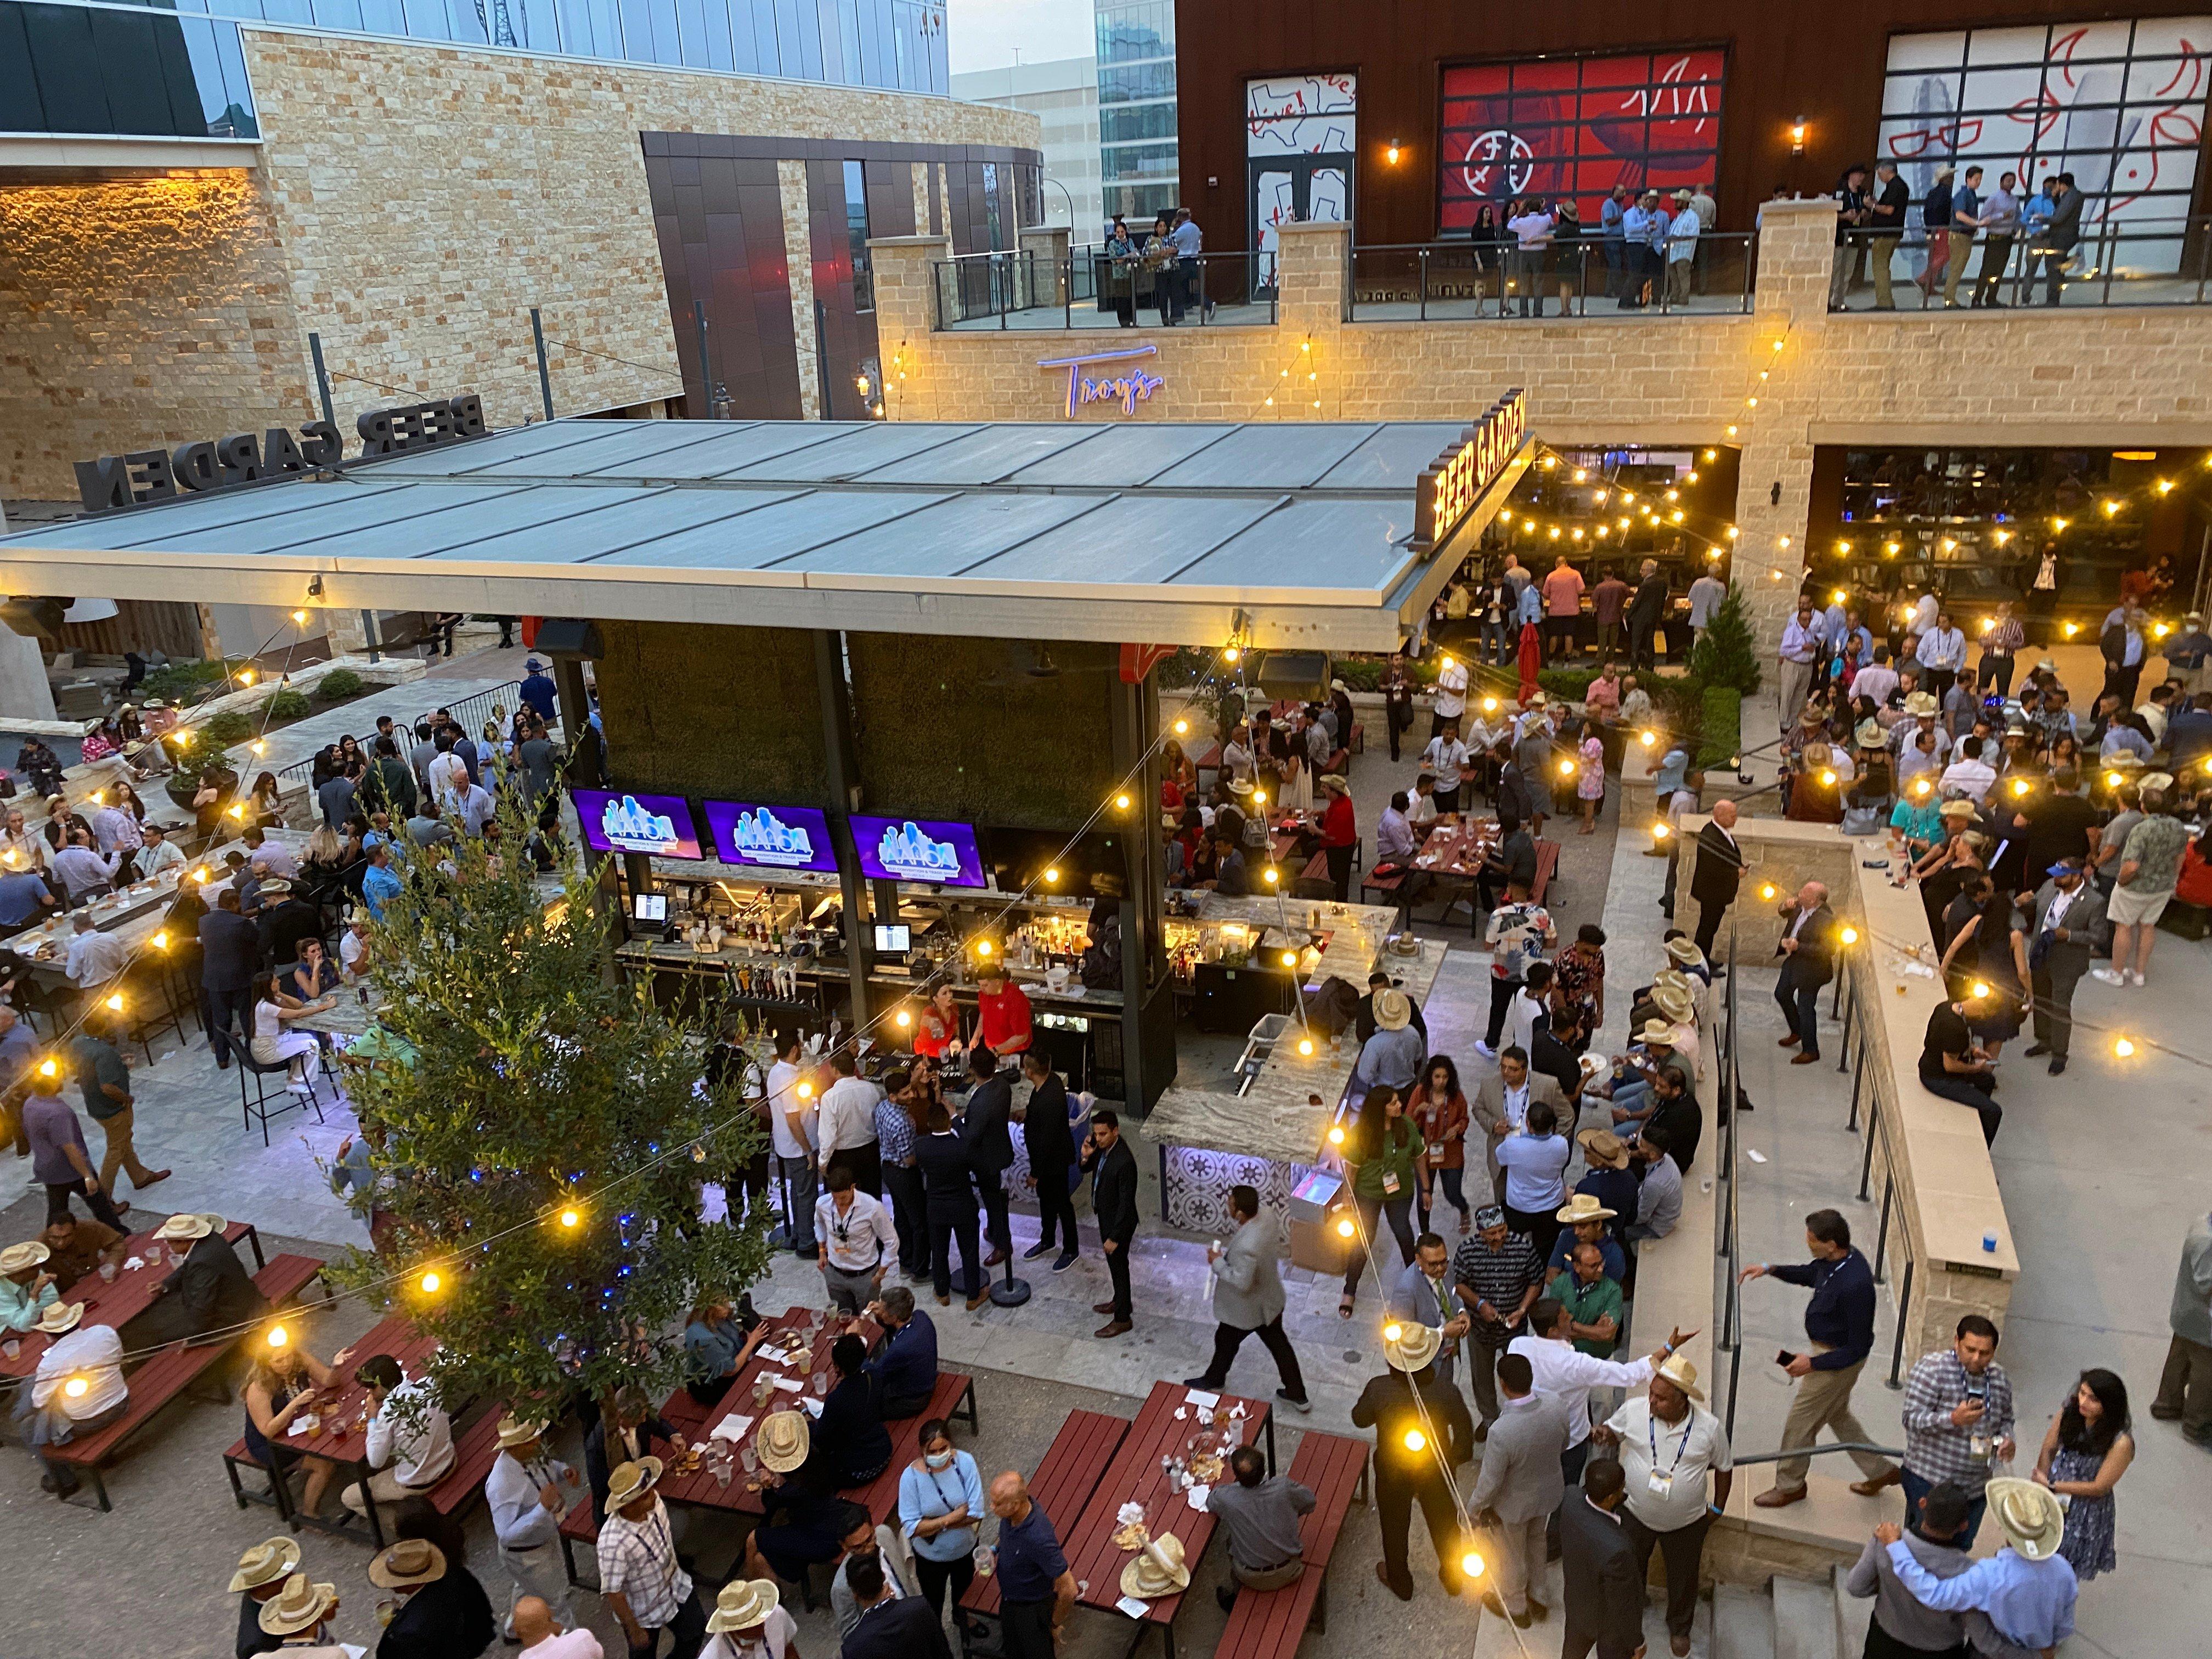 HotelFurniture.com at AAHOACON TexasLive